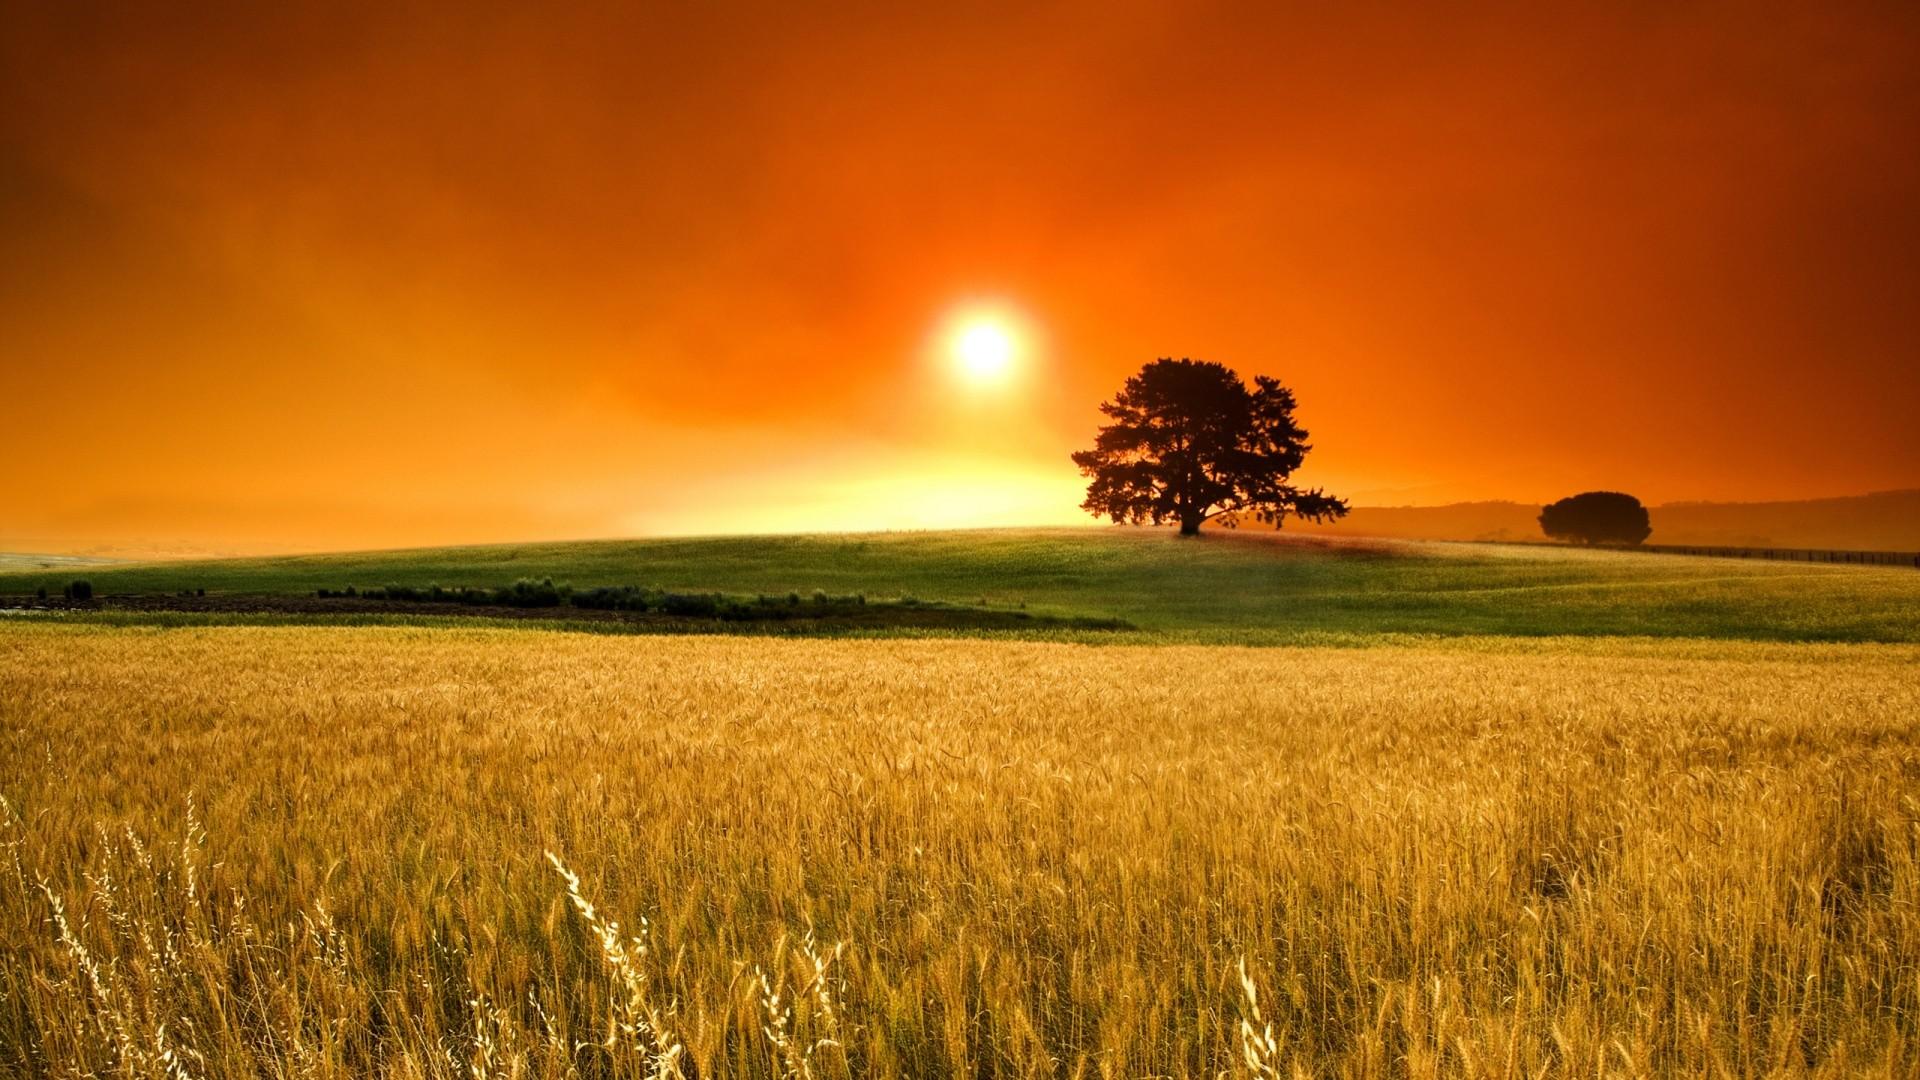 Fields: Wheat Living Nature Tree Golden Sky Sun Grass Country Orange ...